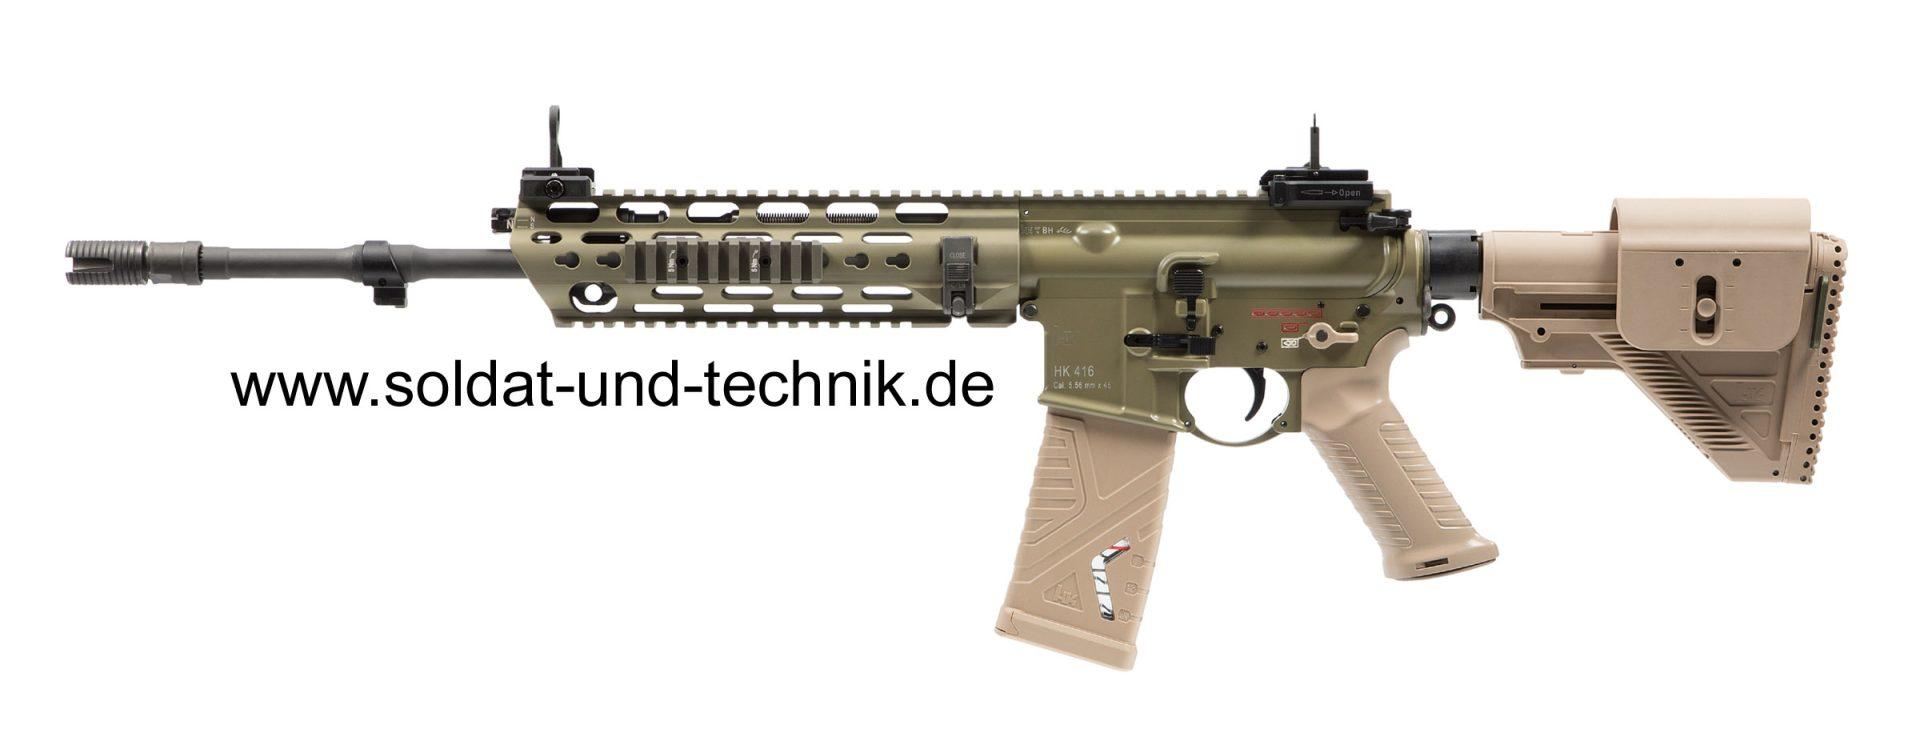 HK416-A8-165-System-Sturmgewehr-Bundeswe